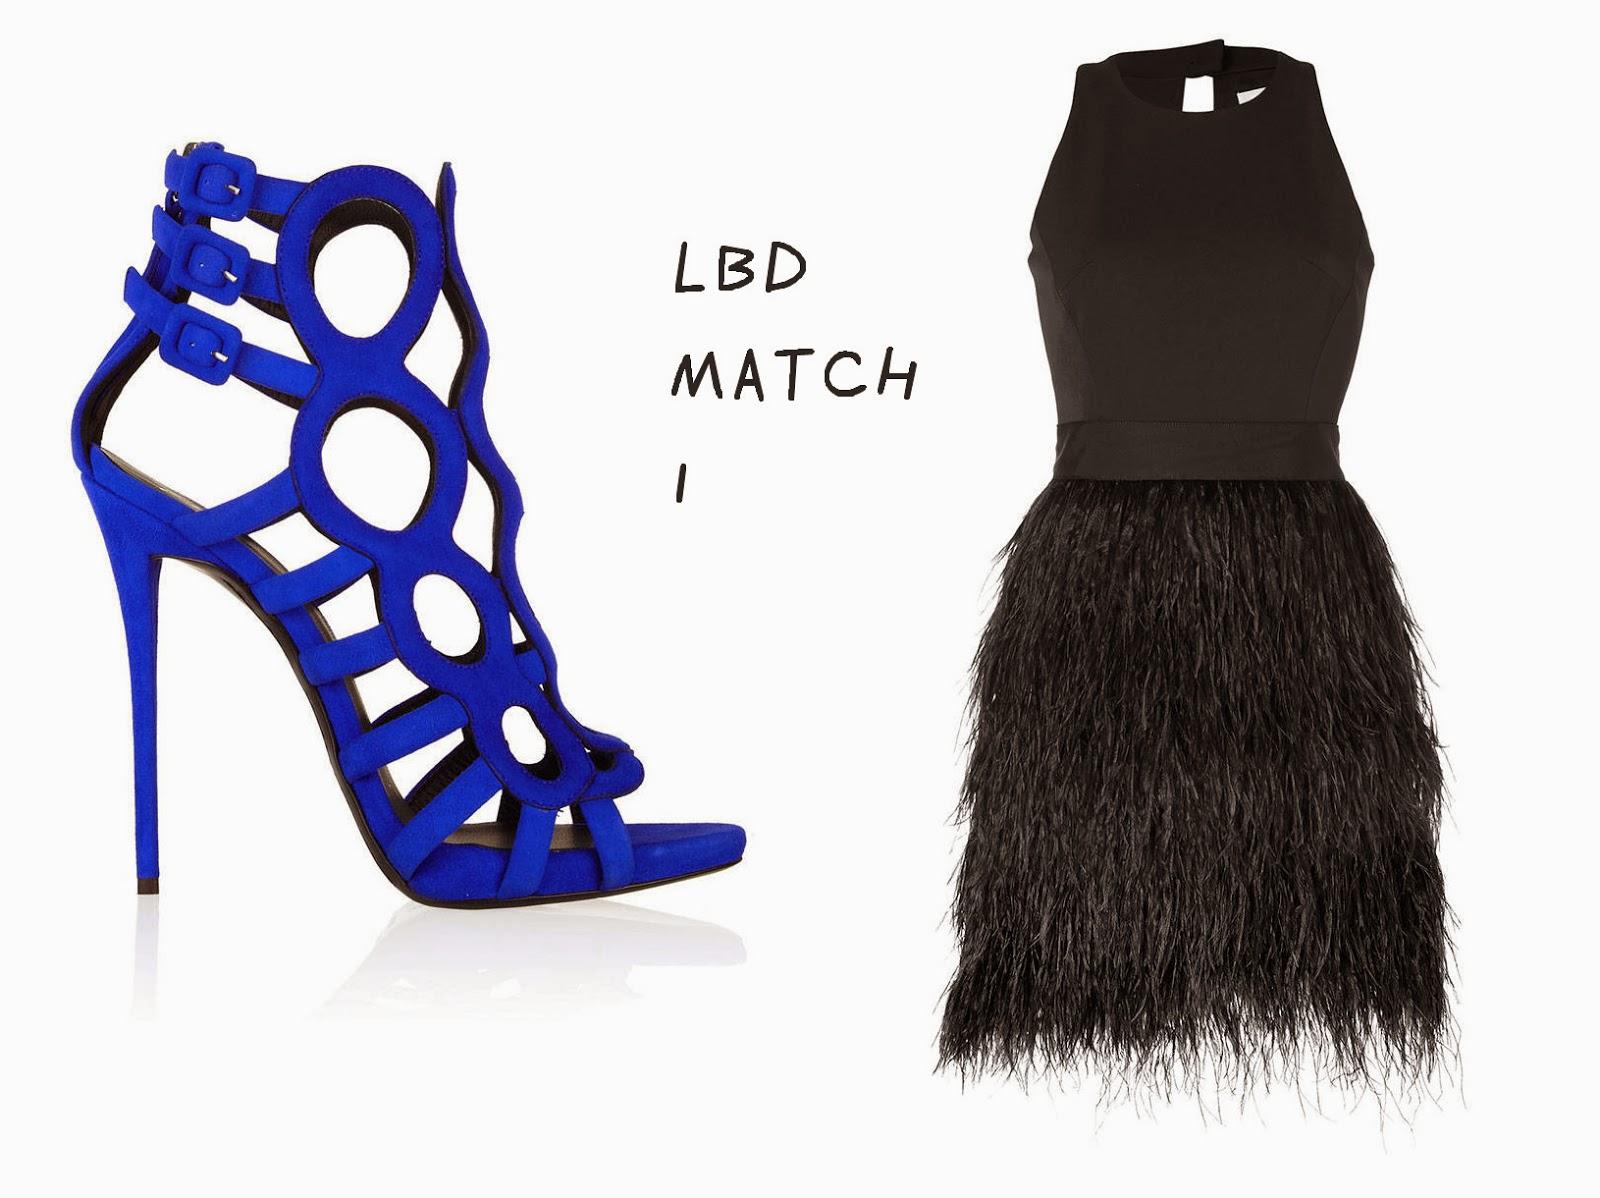 LBD match 1